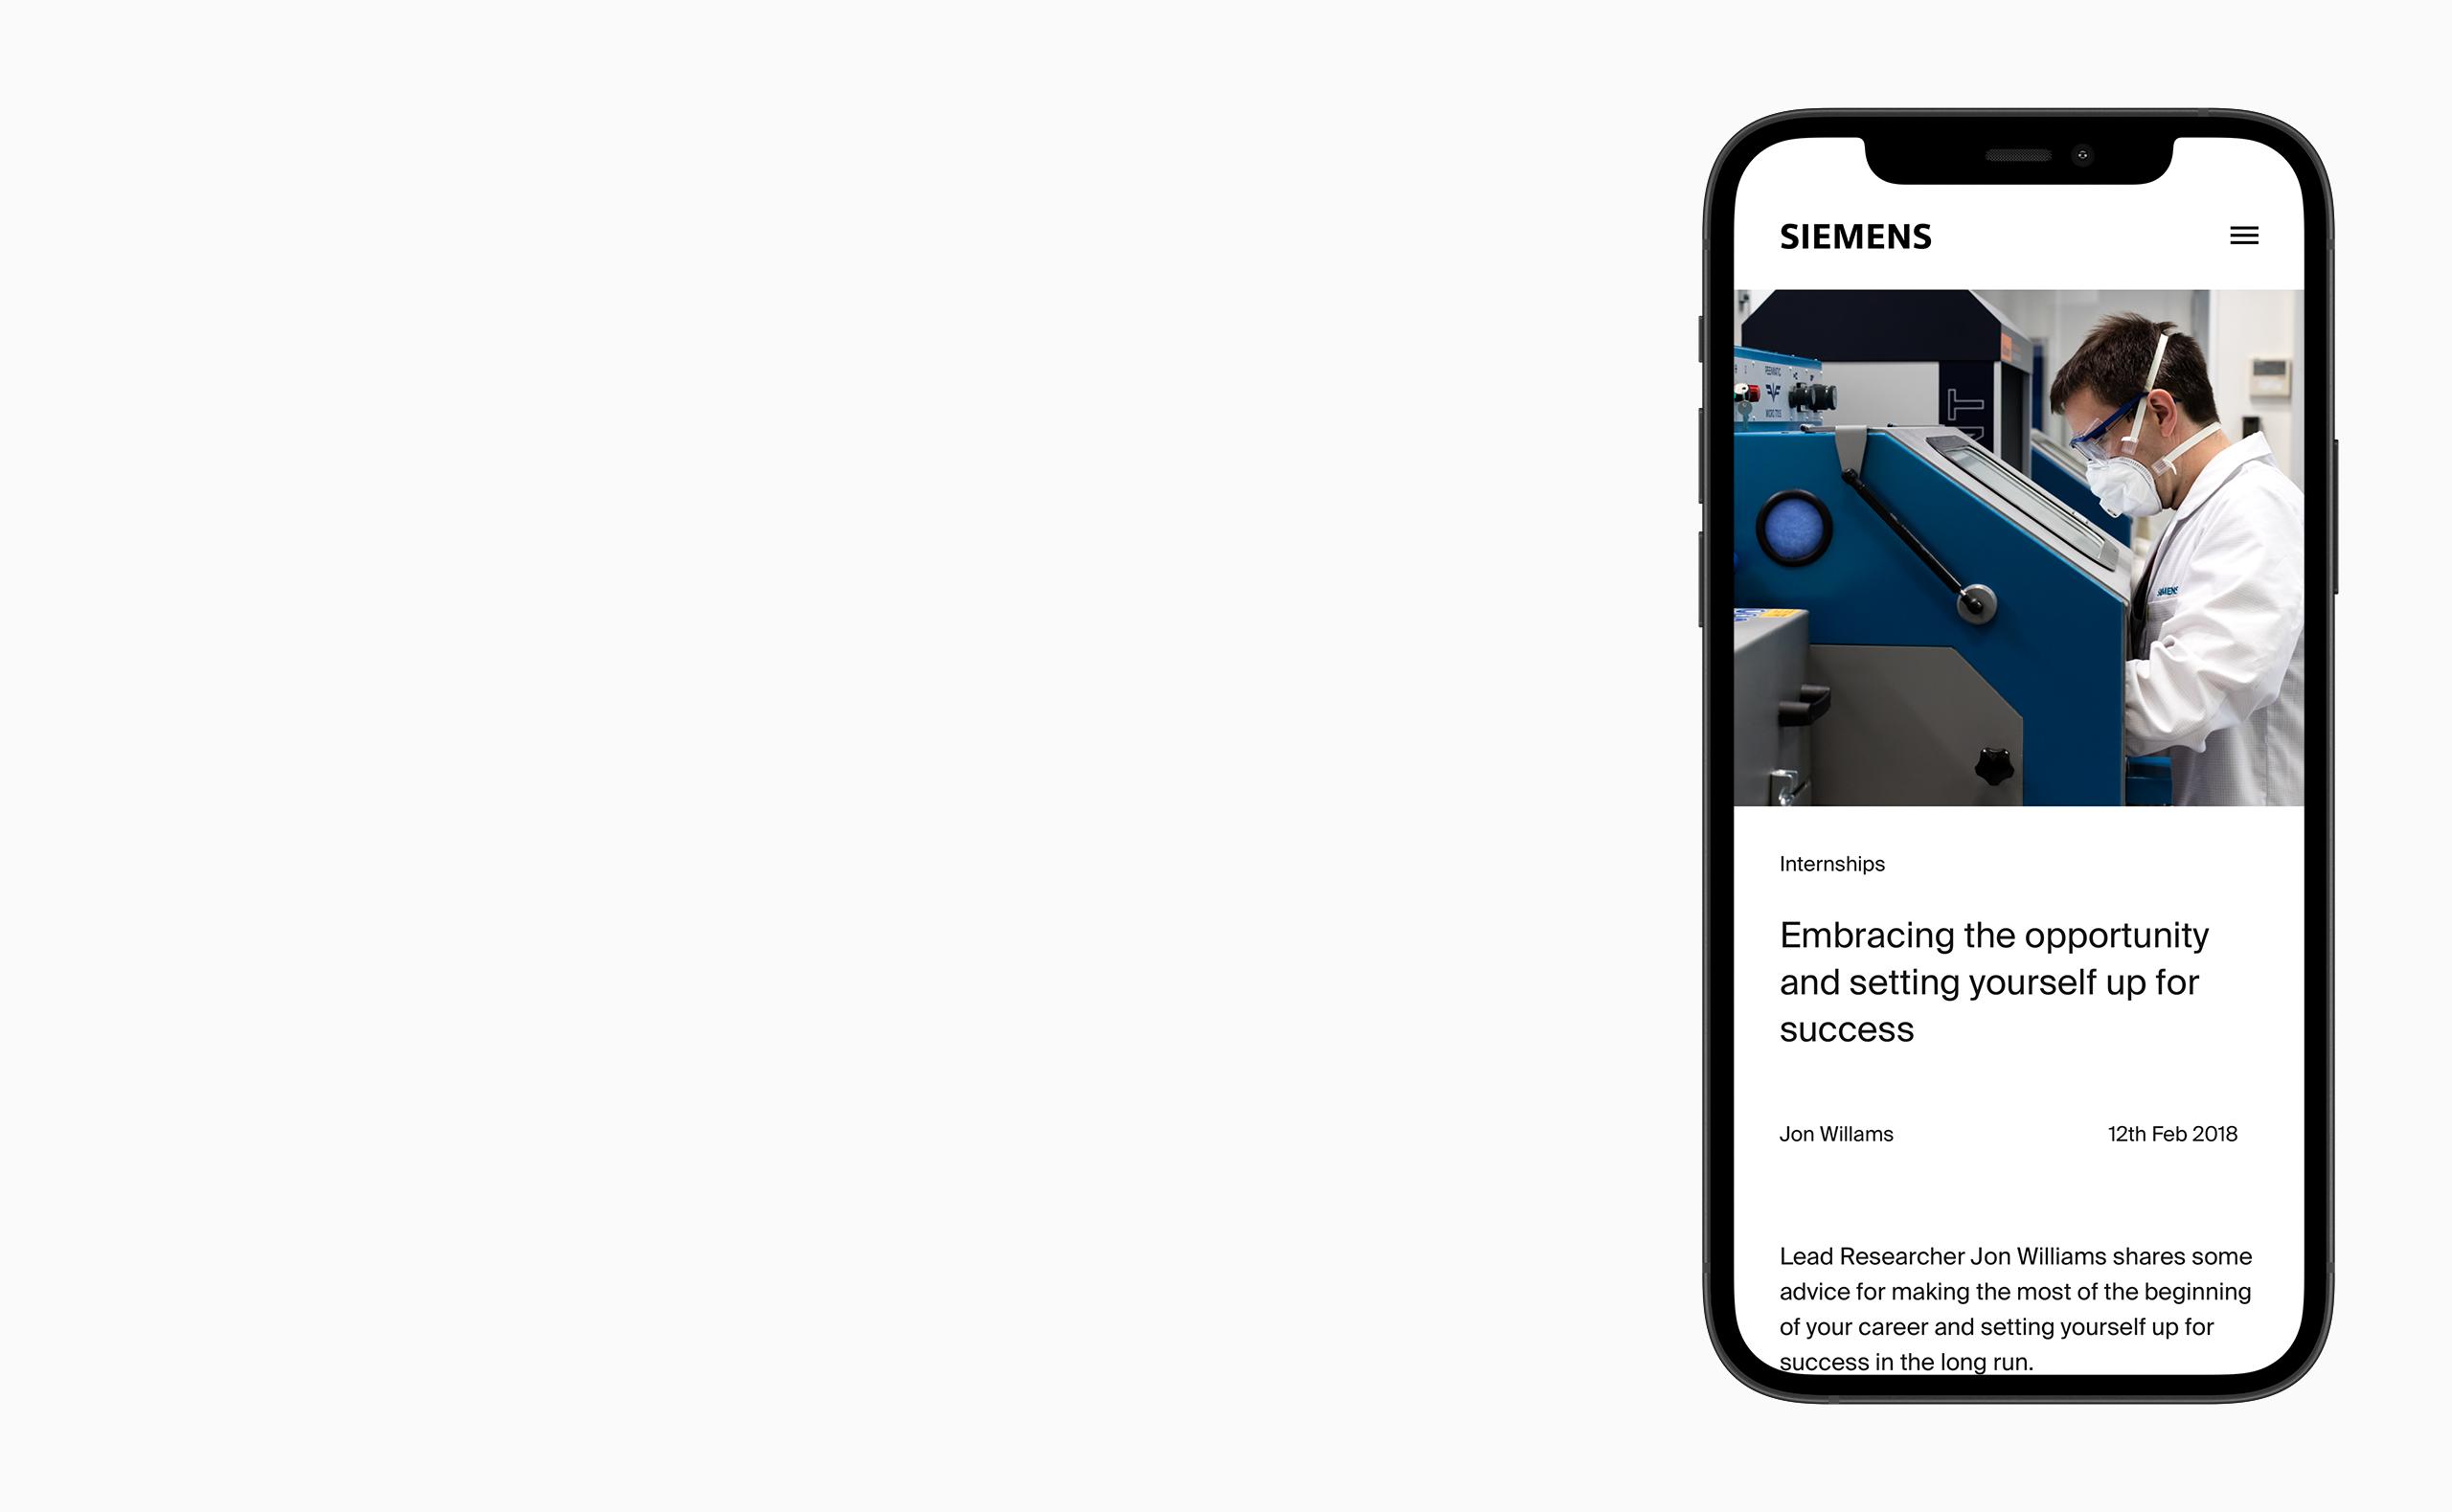 iPhone12_Siemens_Story